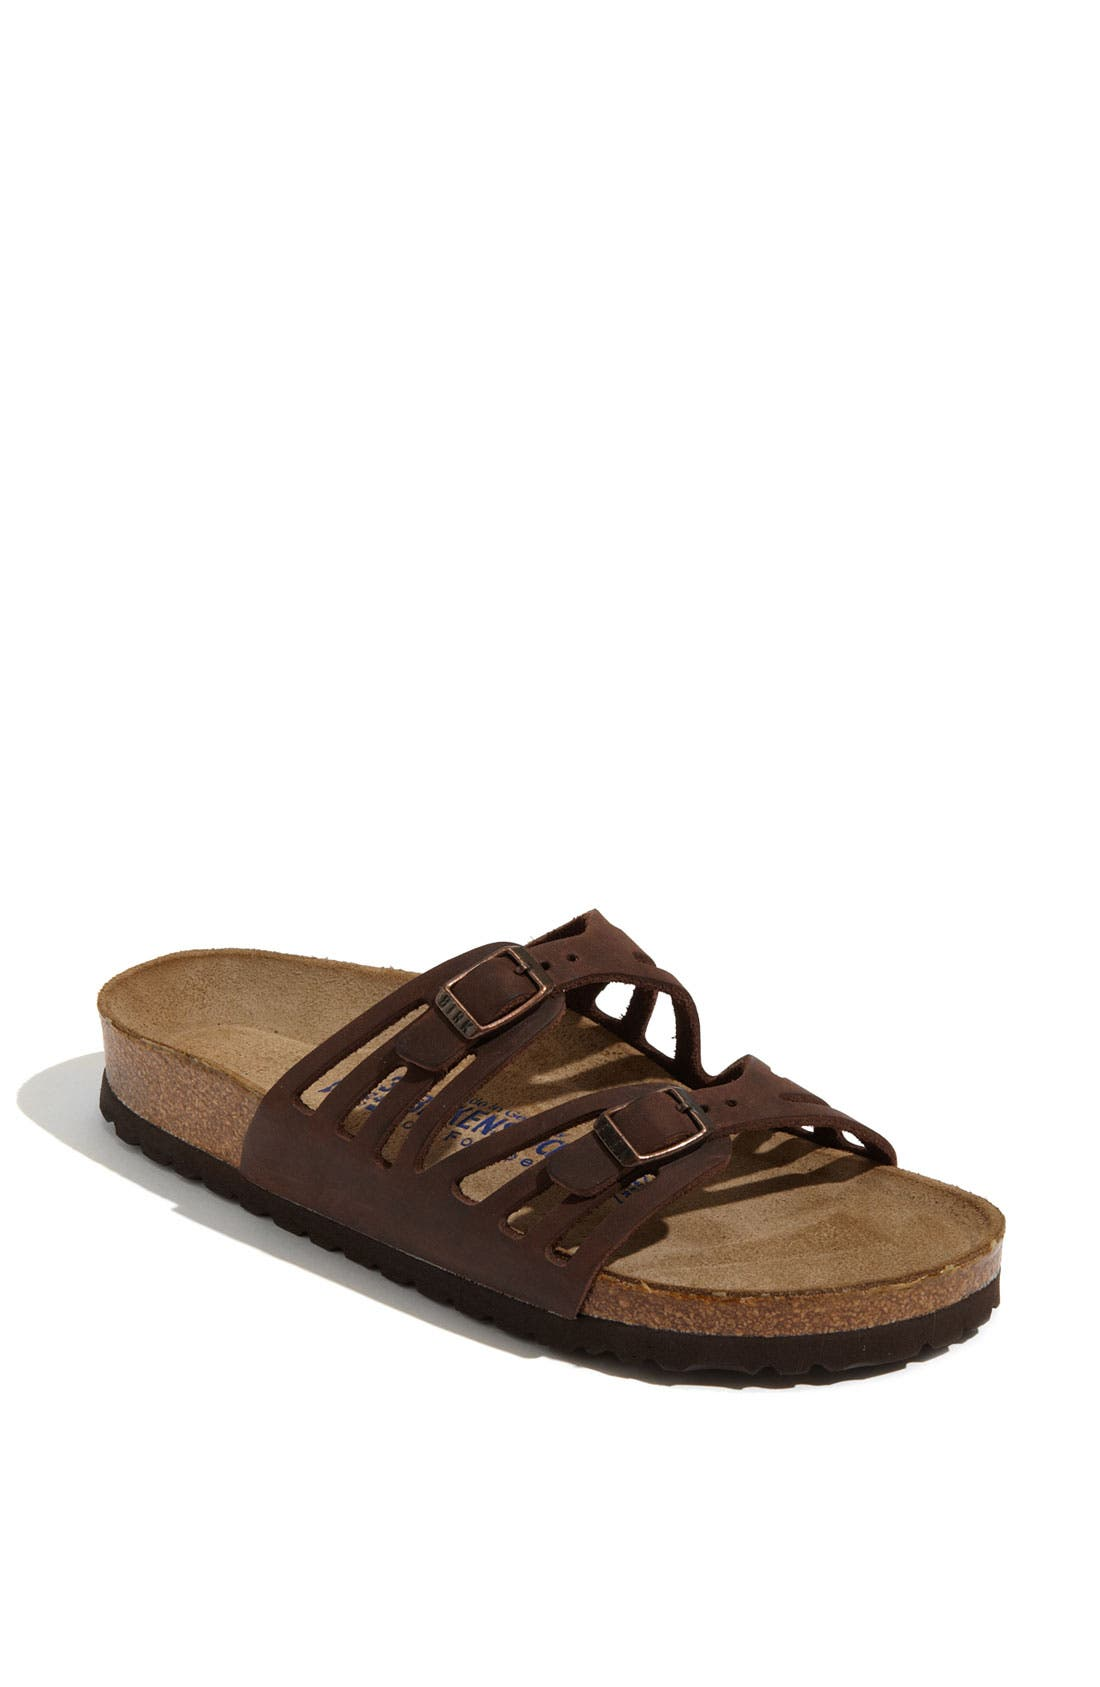 Alternate Image 1 Selected - Birkenstock Granada Soft Footbed Oiled Leather Sandal (Women)